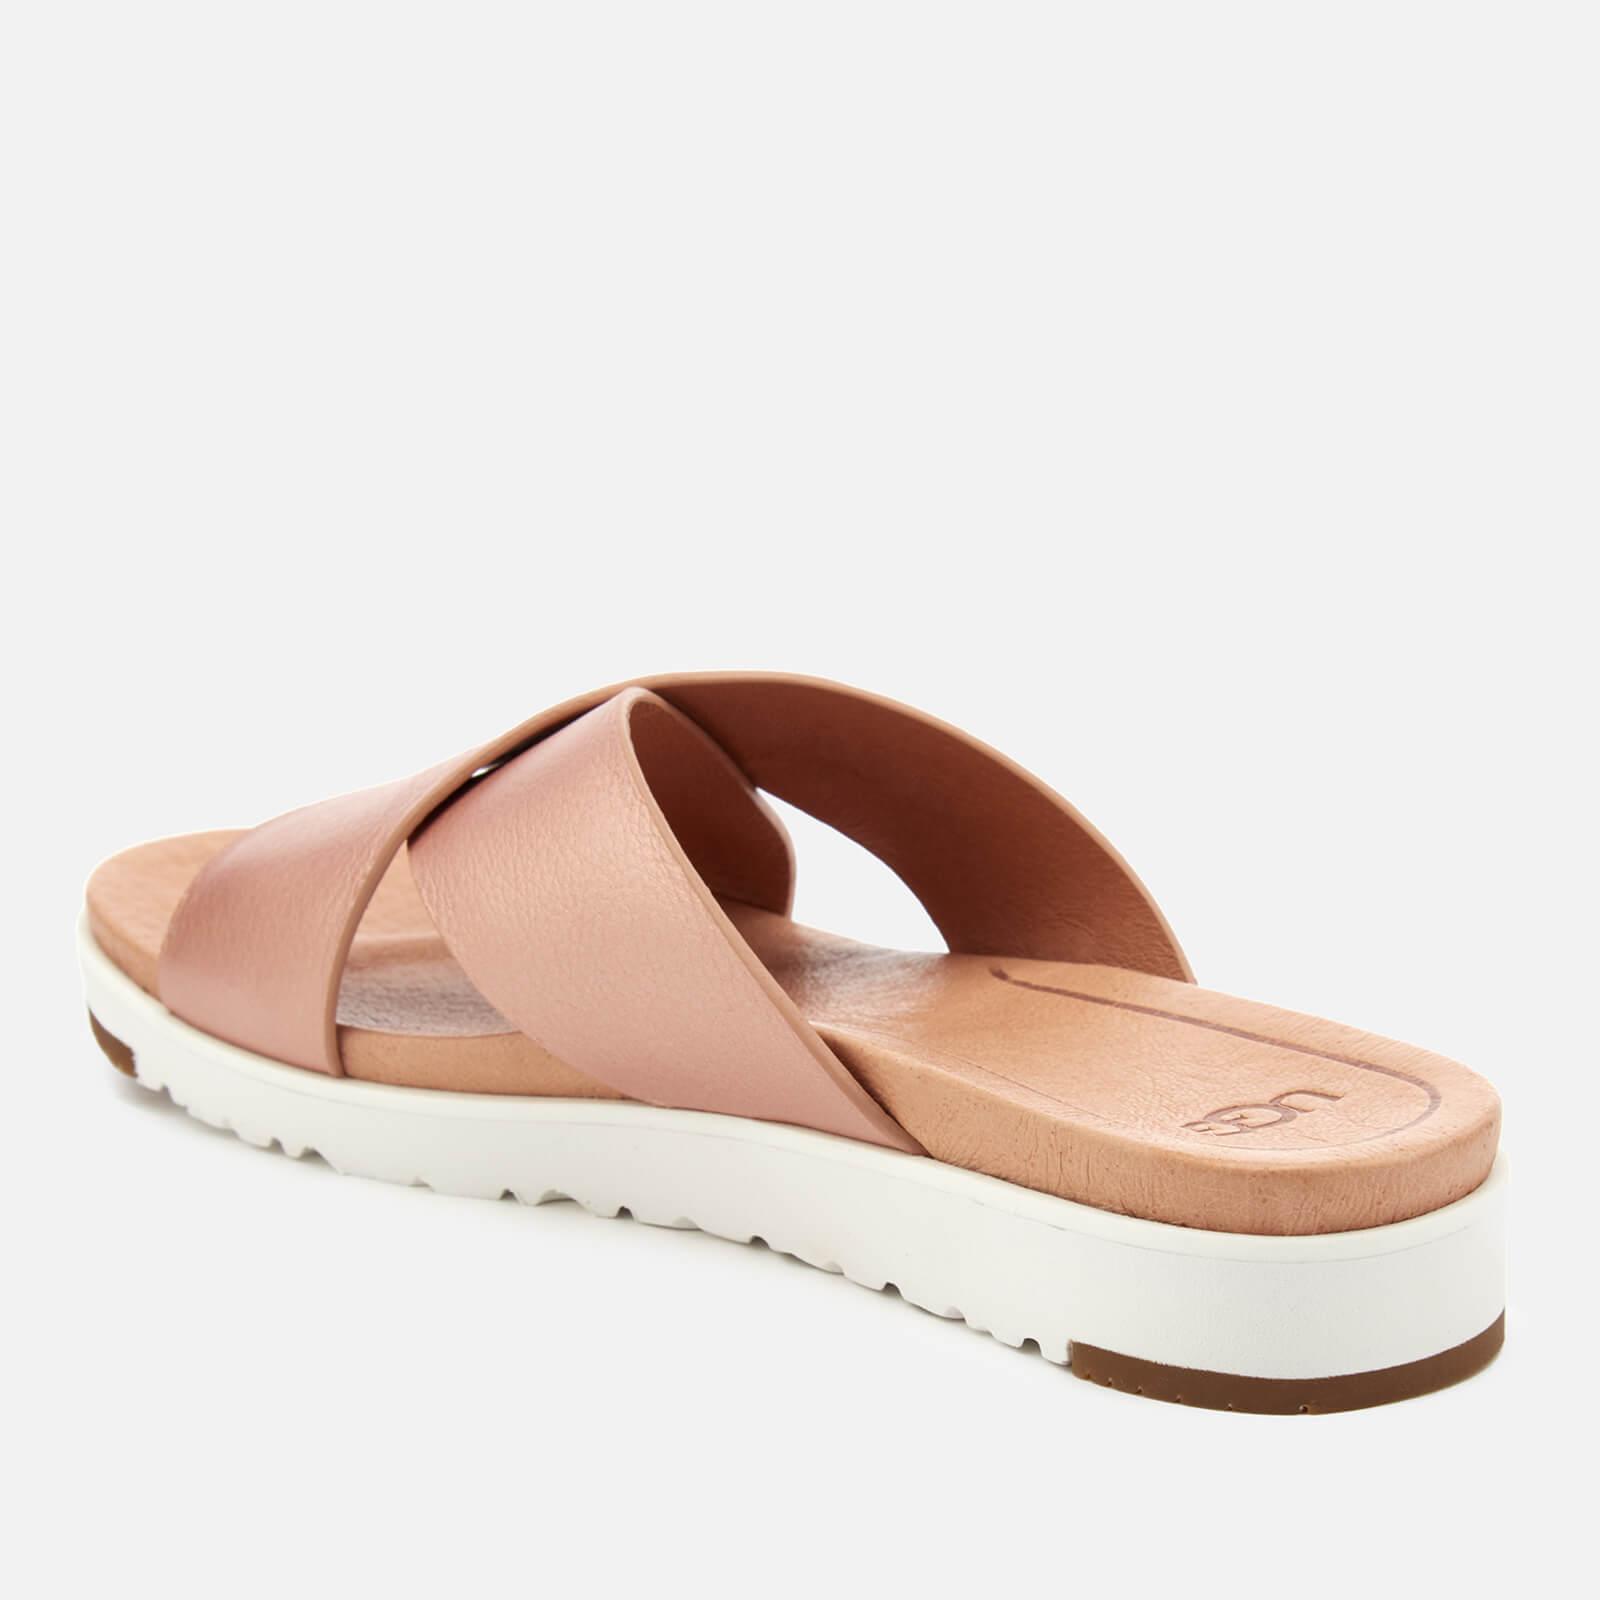 337d91c71933 Ugg - Pink Kari Metallic Cross Strap Slide Sandals - Lyst. View fullscreen